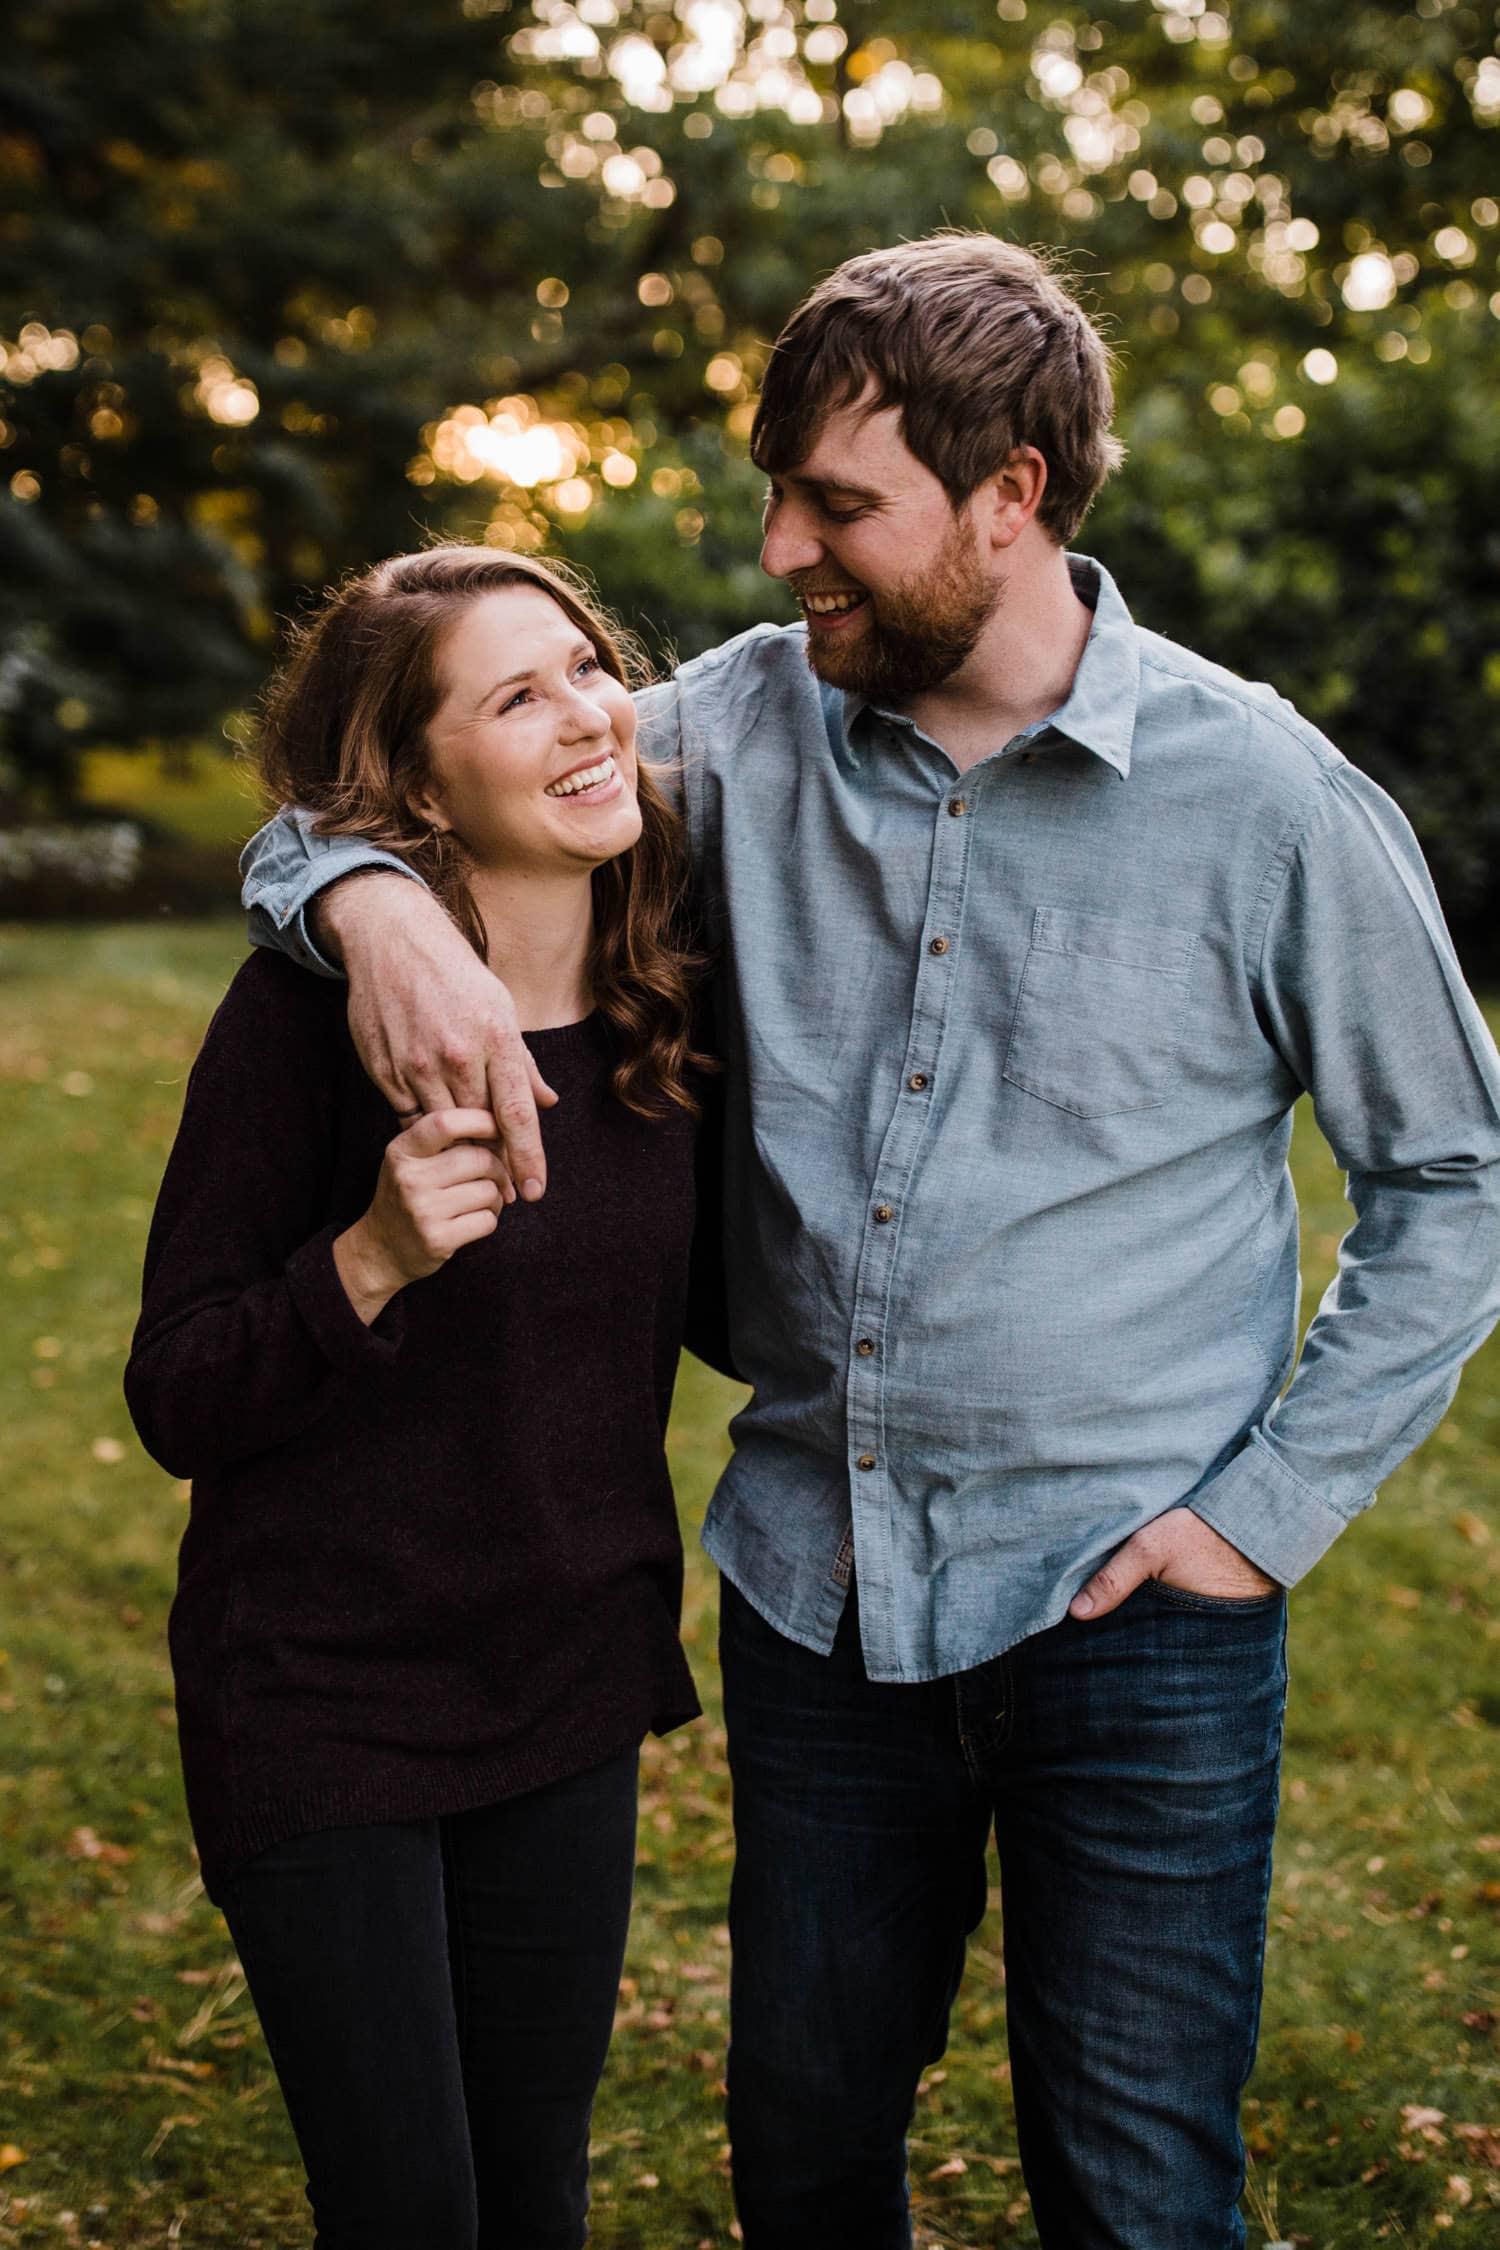 couple laugh and walk together - ottawa arboretum engagement